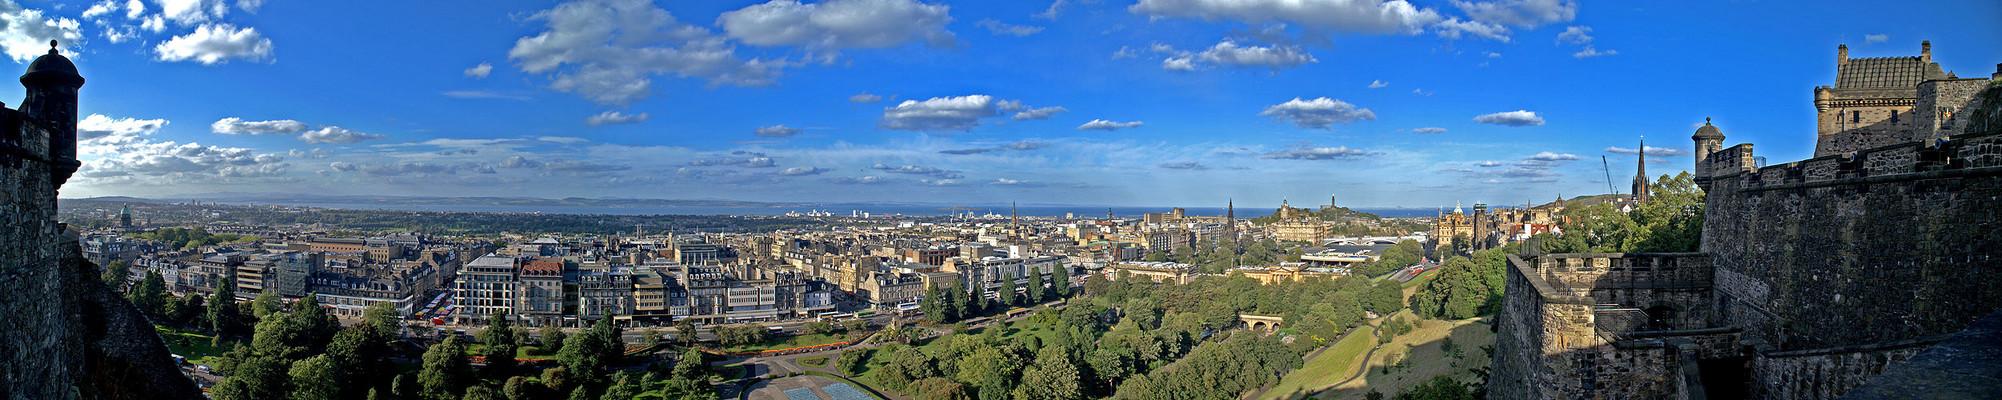 Edinburgh / Scotland, view from Edinburgh Castle to new town...